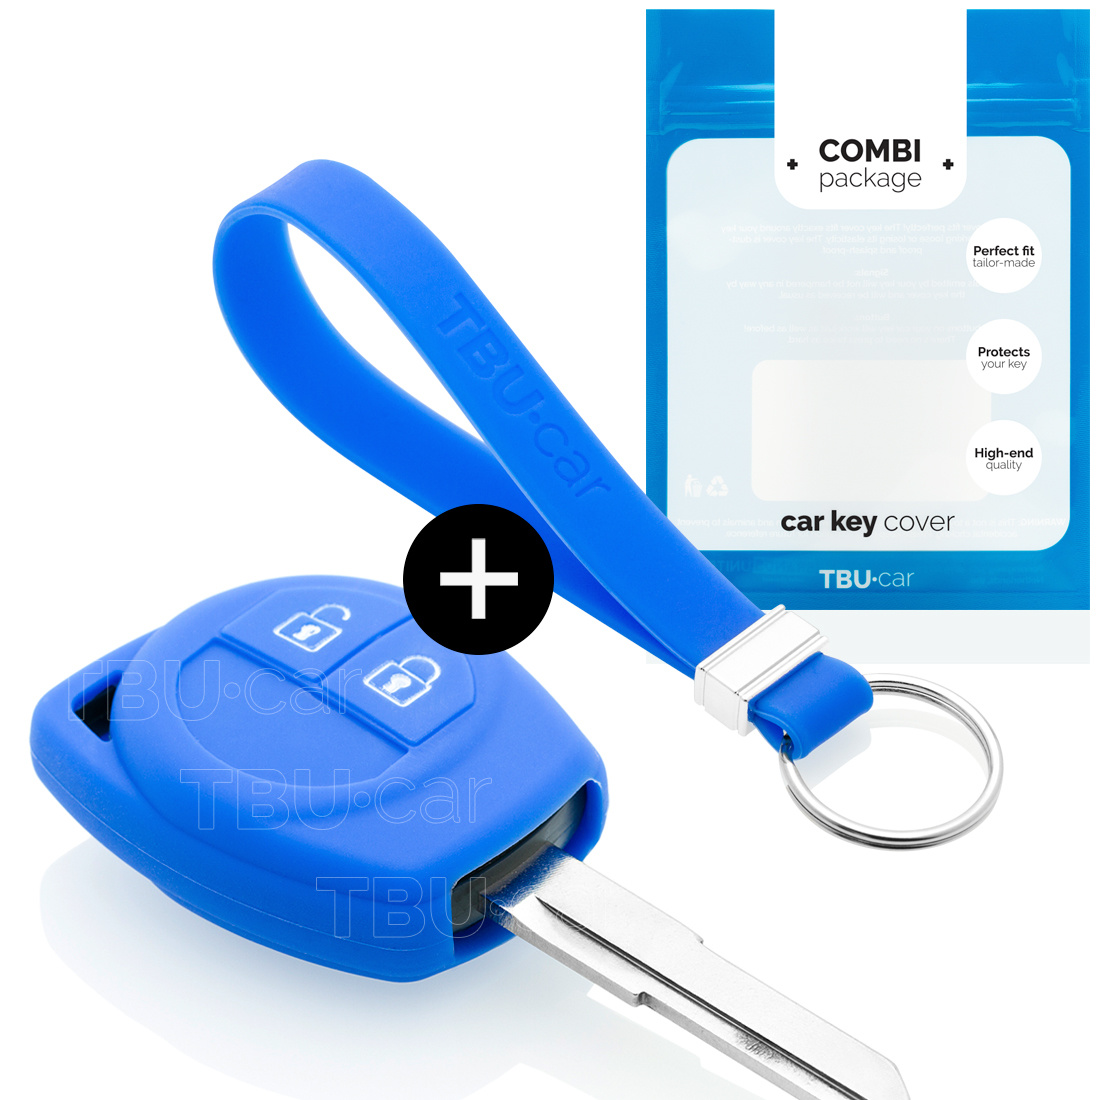 TBU car TBU car Autoschlüssel Hülle kompatibel mit Suzuki 2 Tasten - Schutzhülle aus Silikon - Auto Schlüsselhülle Cover in Blau